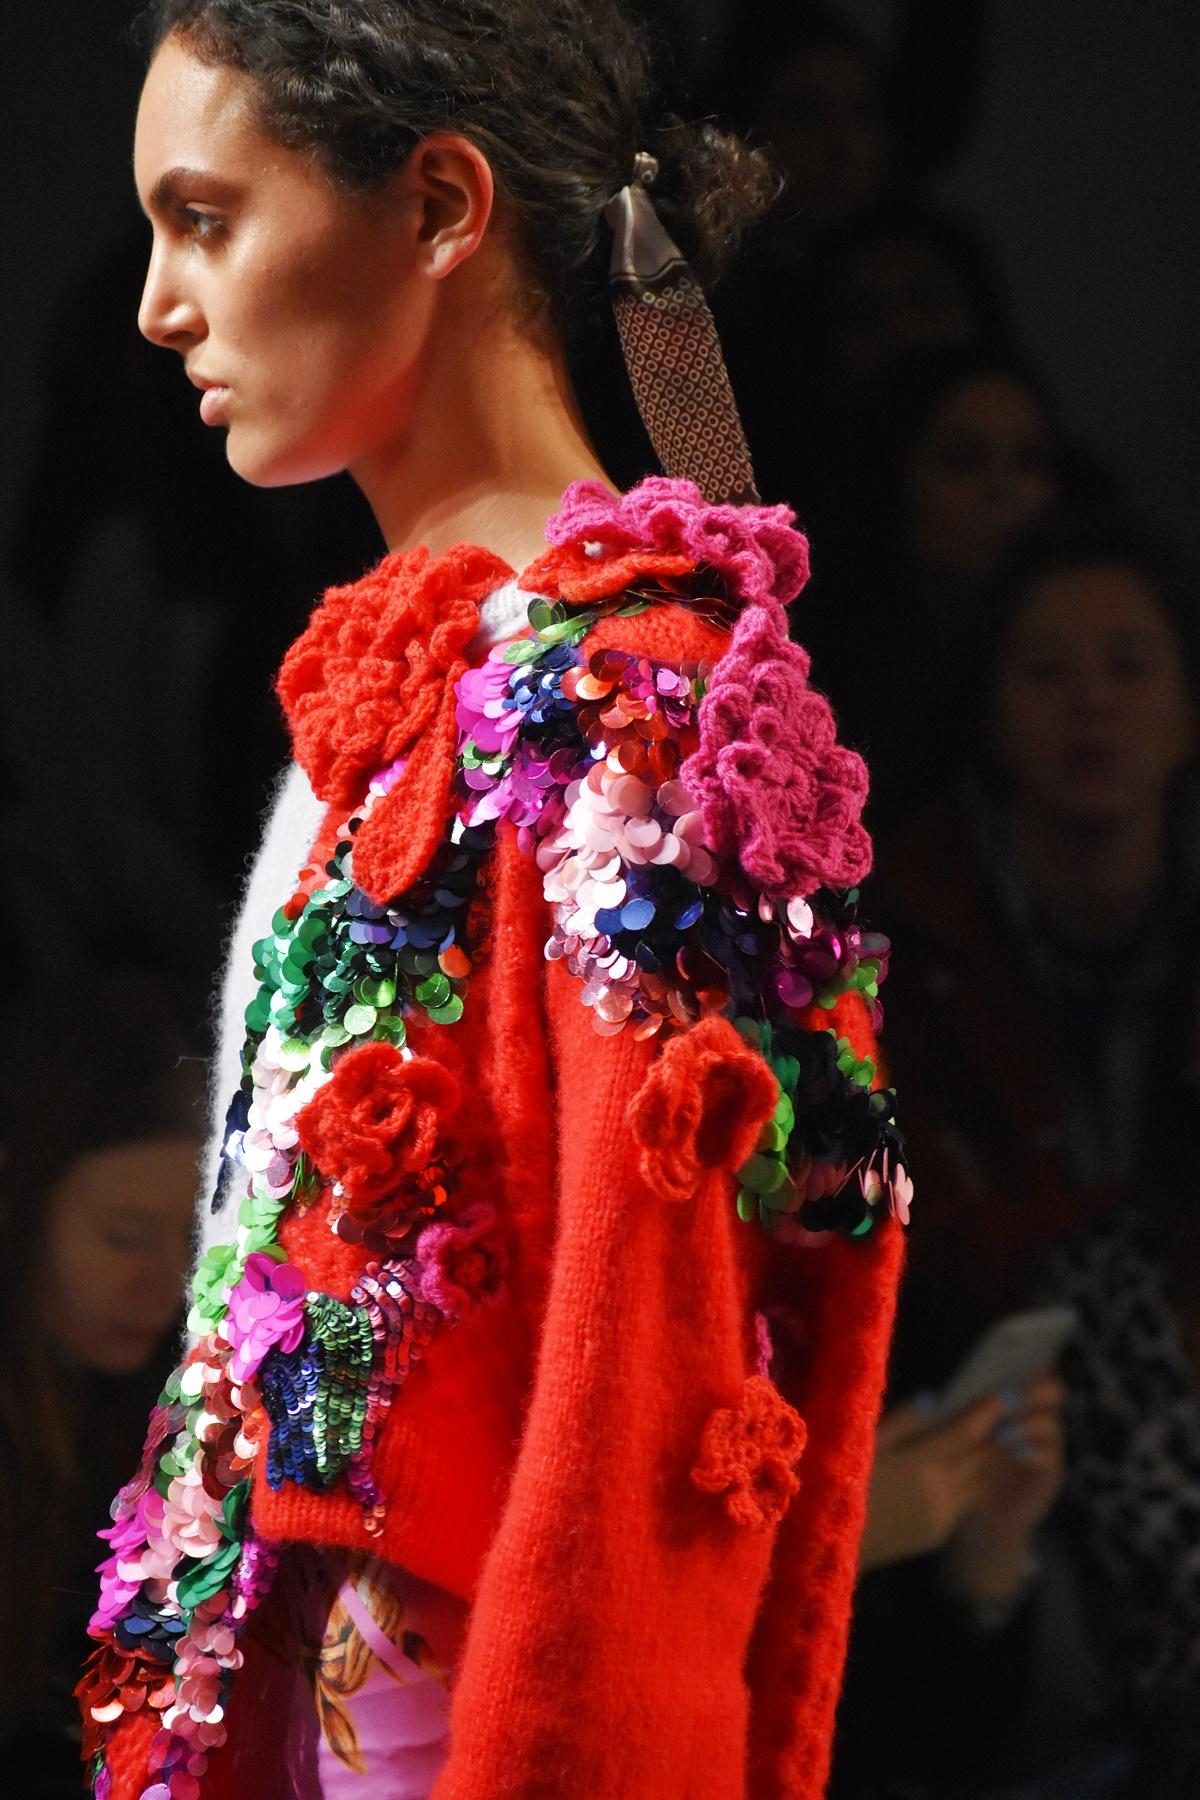 Roberta Einer, Autumn Winter 2019 fashion show, LFW Feb19, Think Feel Discover